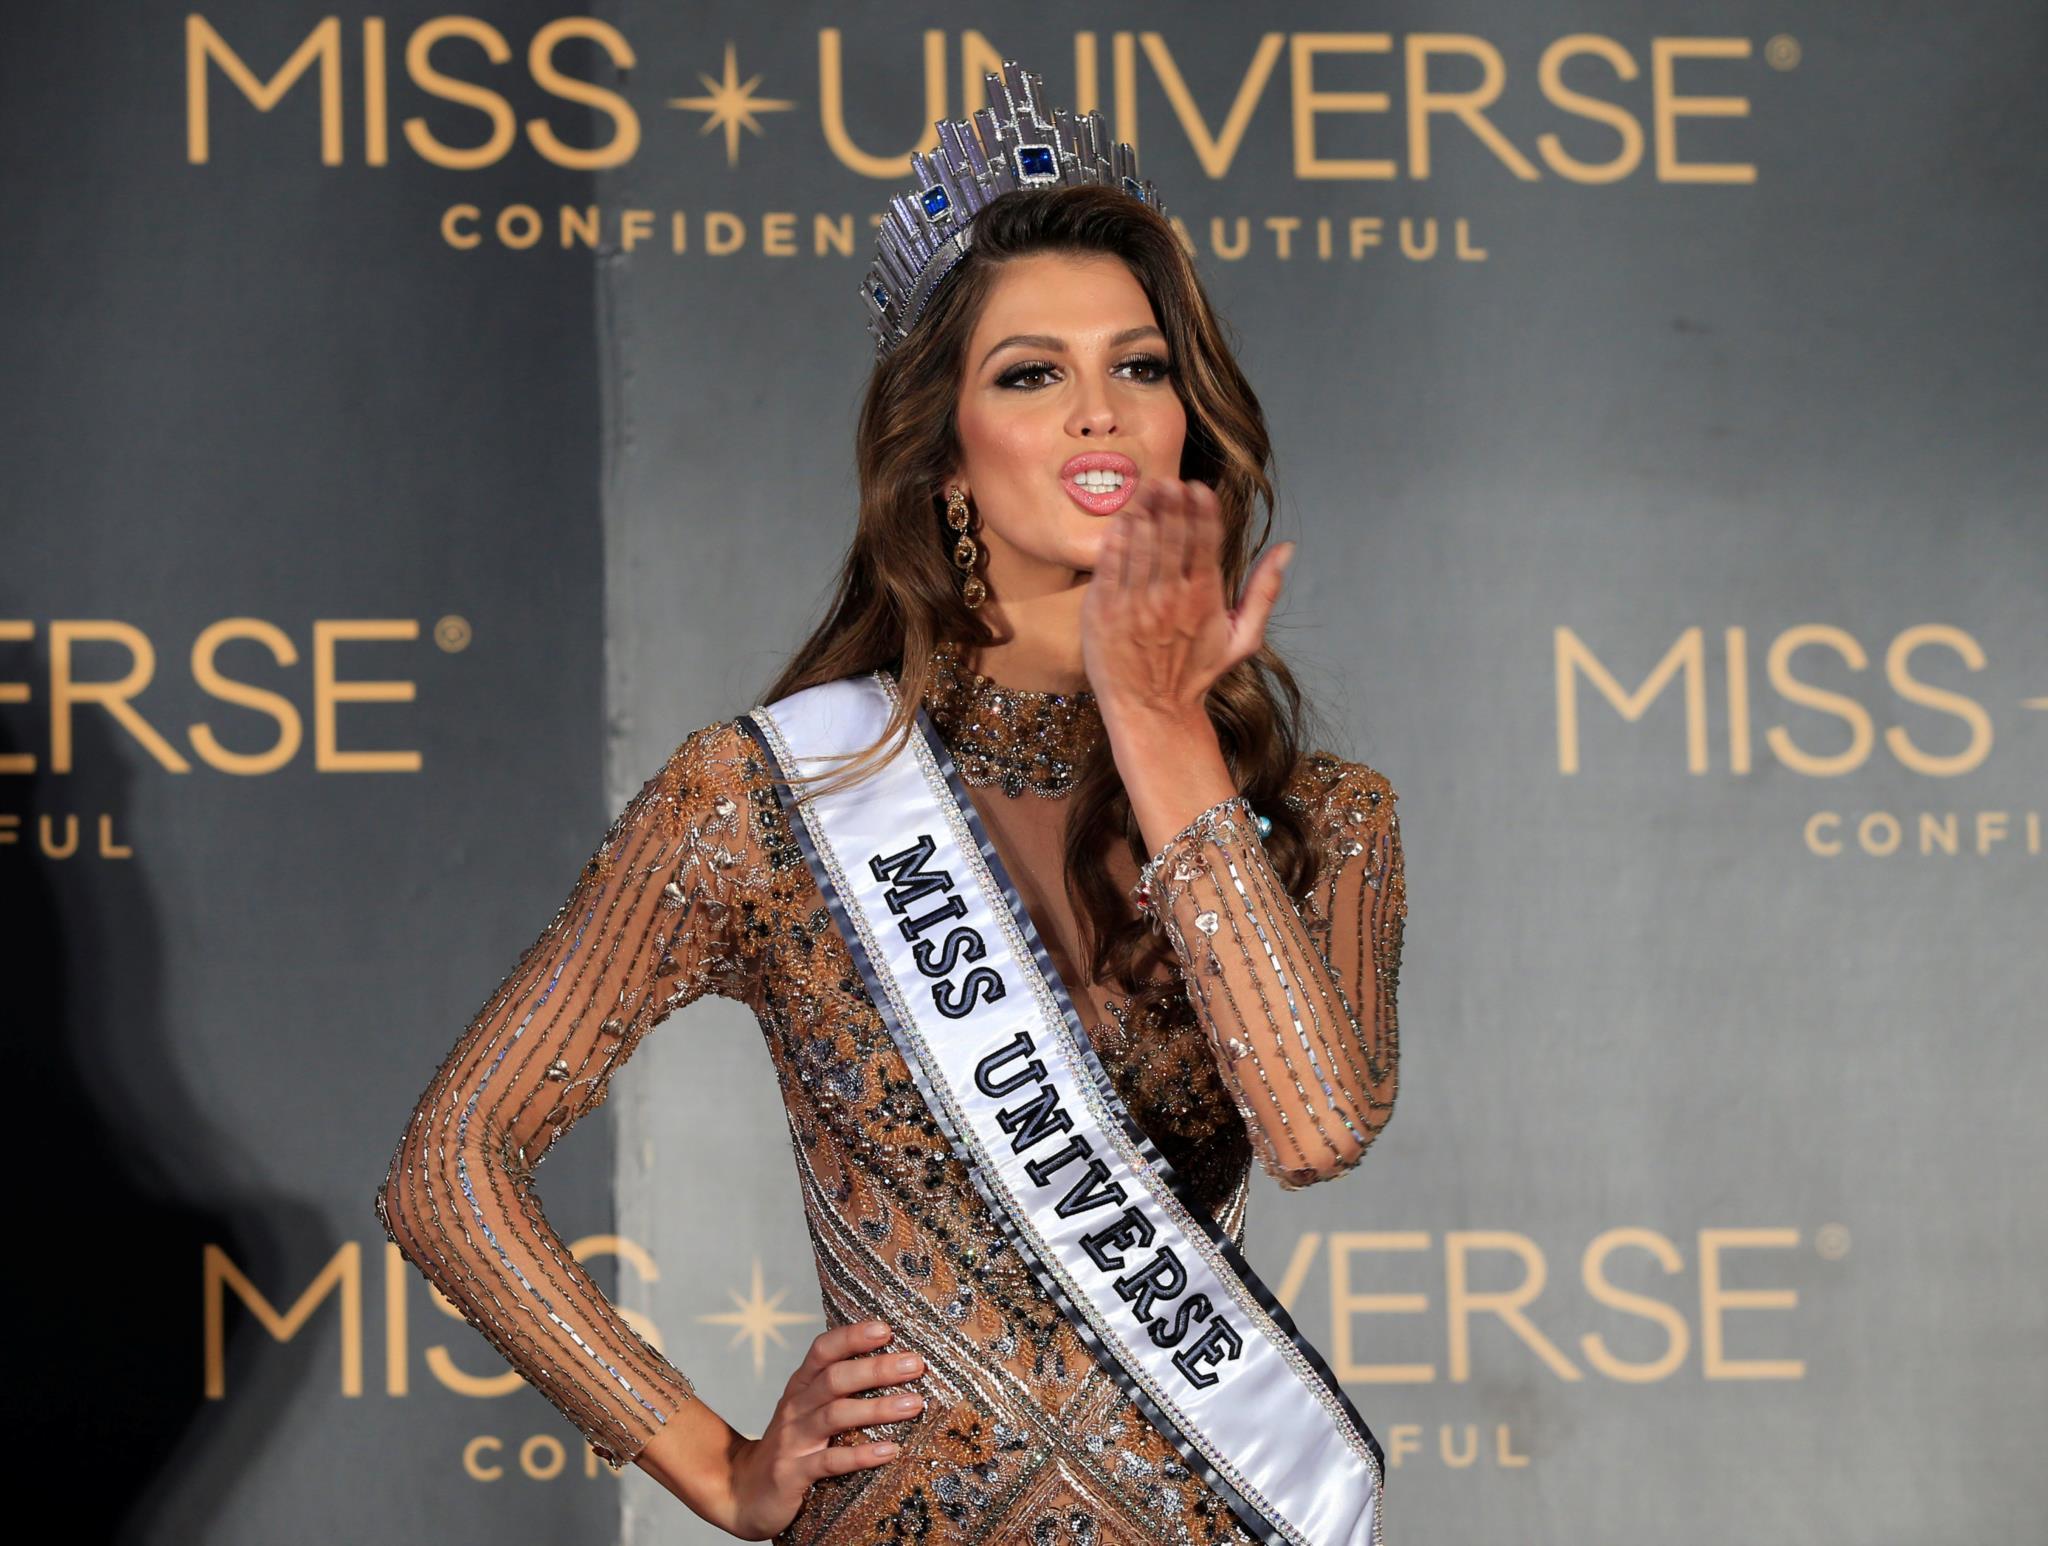 A futura dentista que fez regressar o título de Miss Universo à Europa